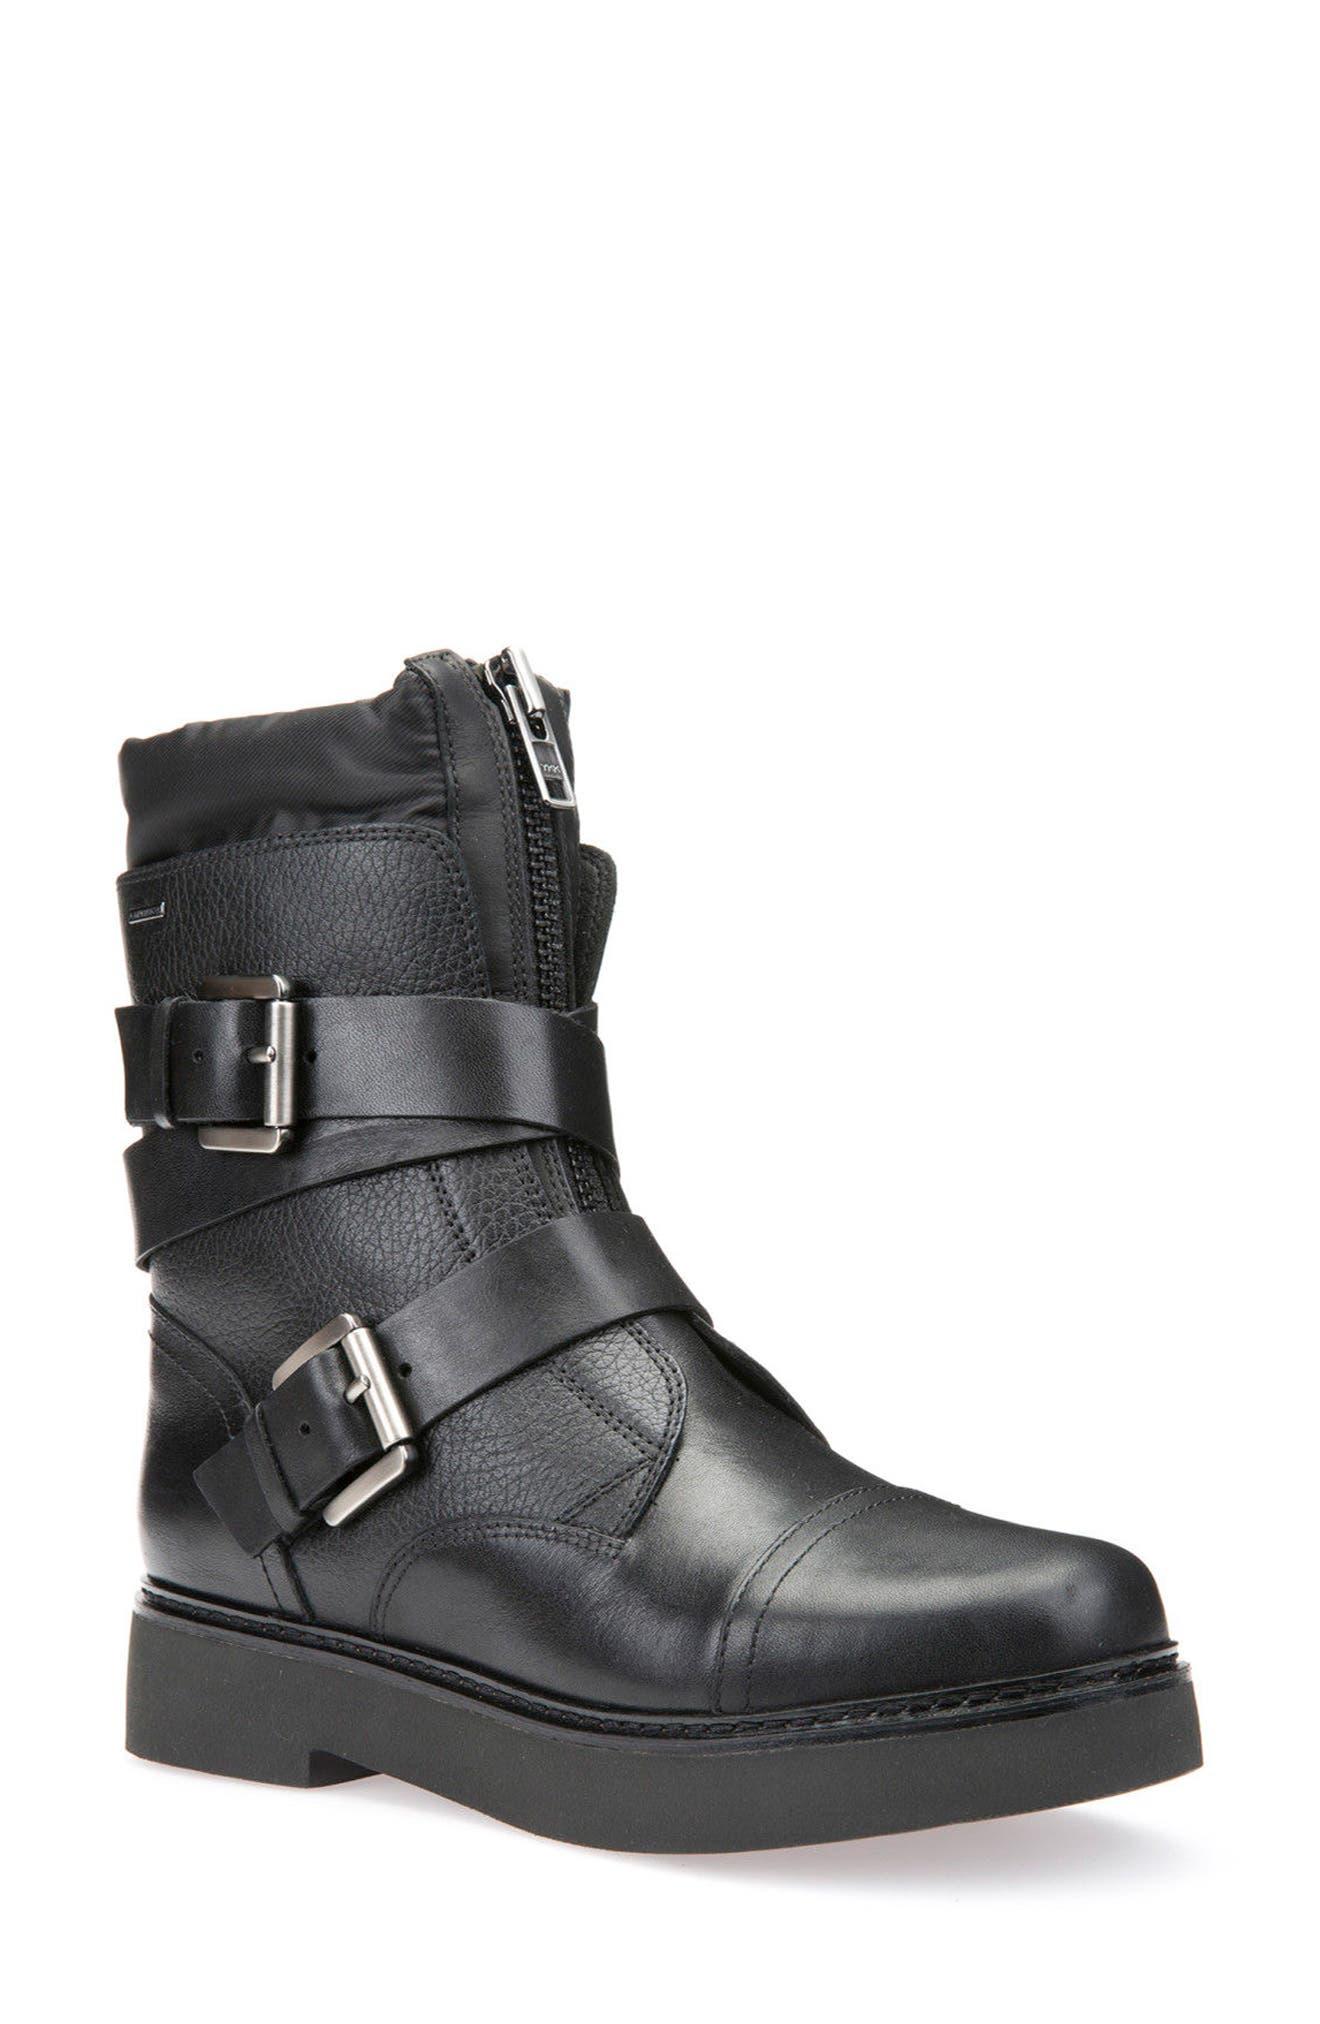 Alternate Image 1 Selected - Geox Rayssa Moto Boot (Women)